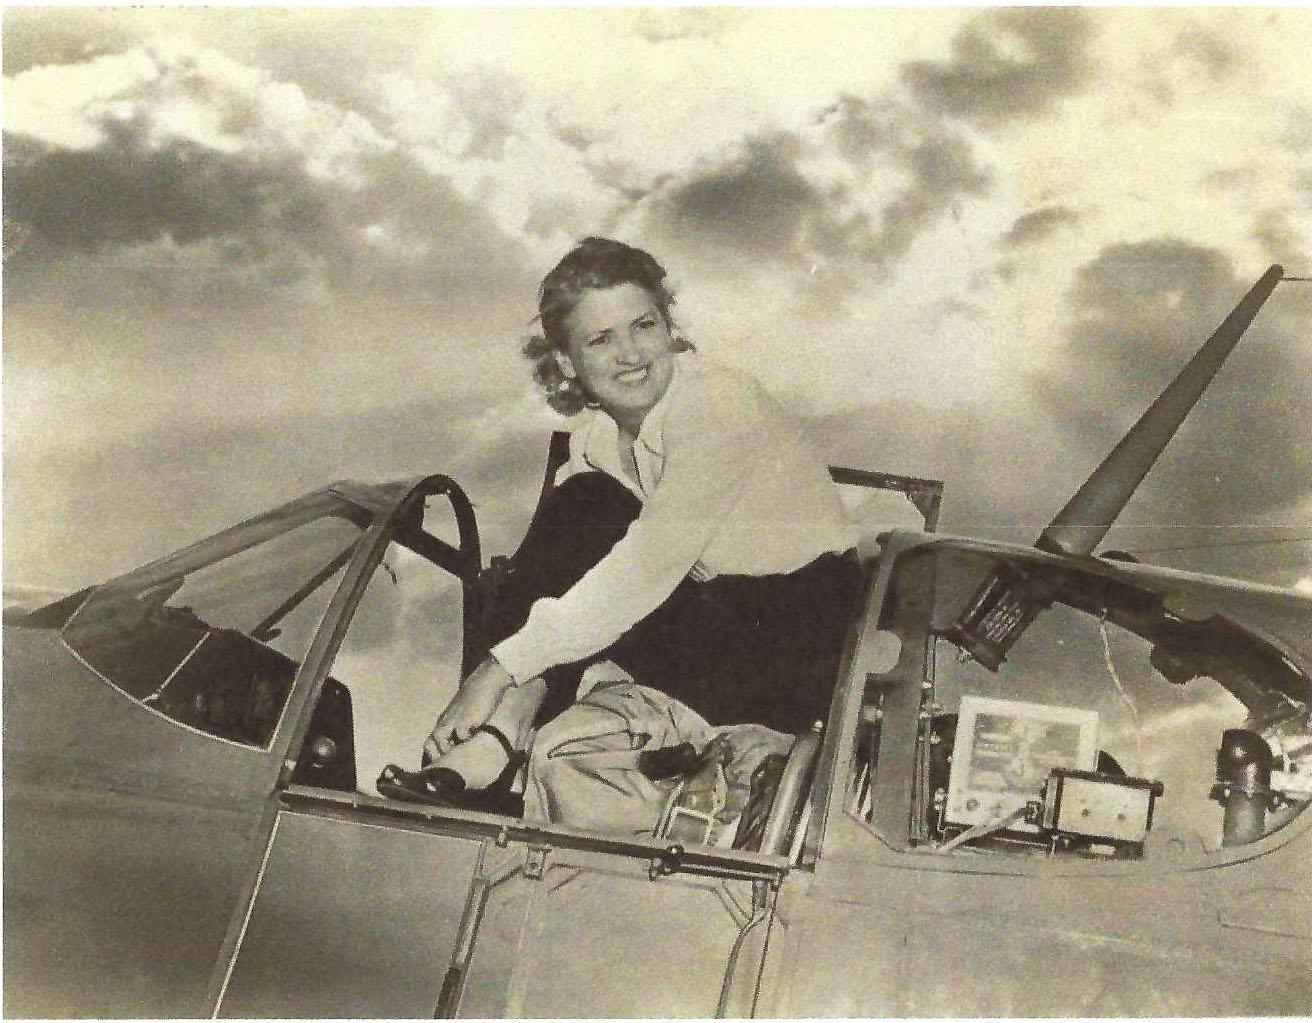 CALLING ALL PILOTS:  MEET JACKIE COCHRAN